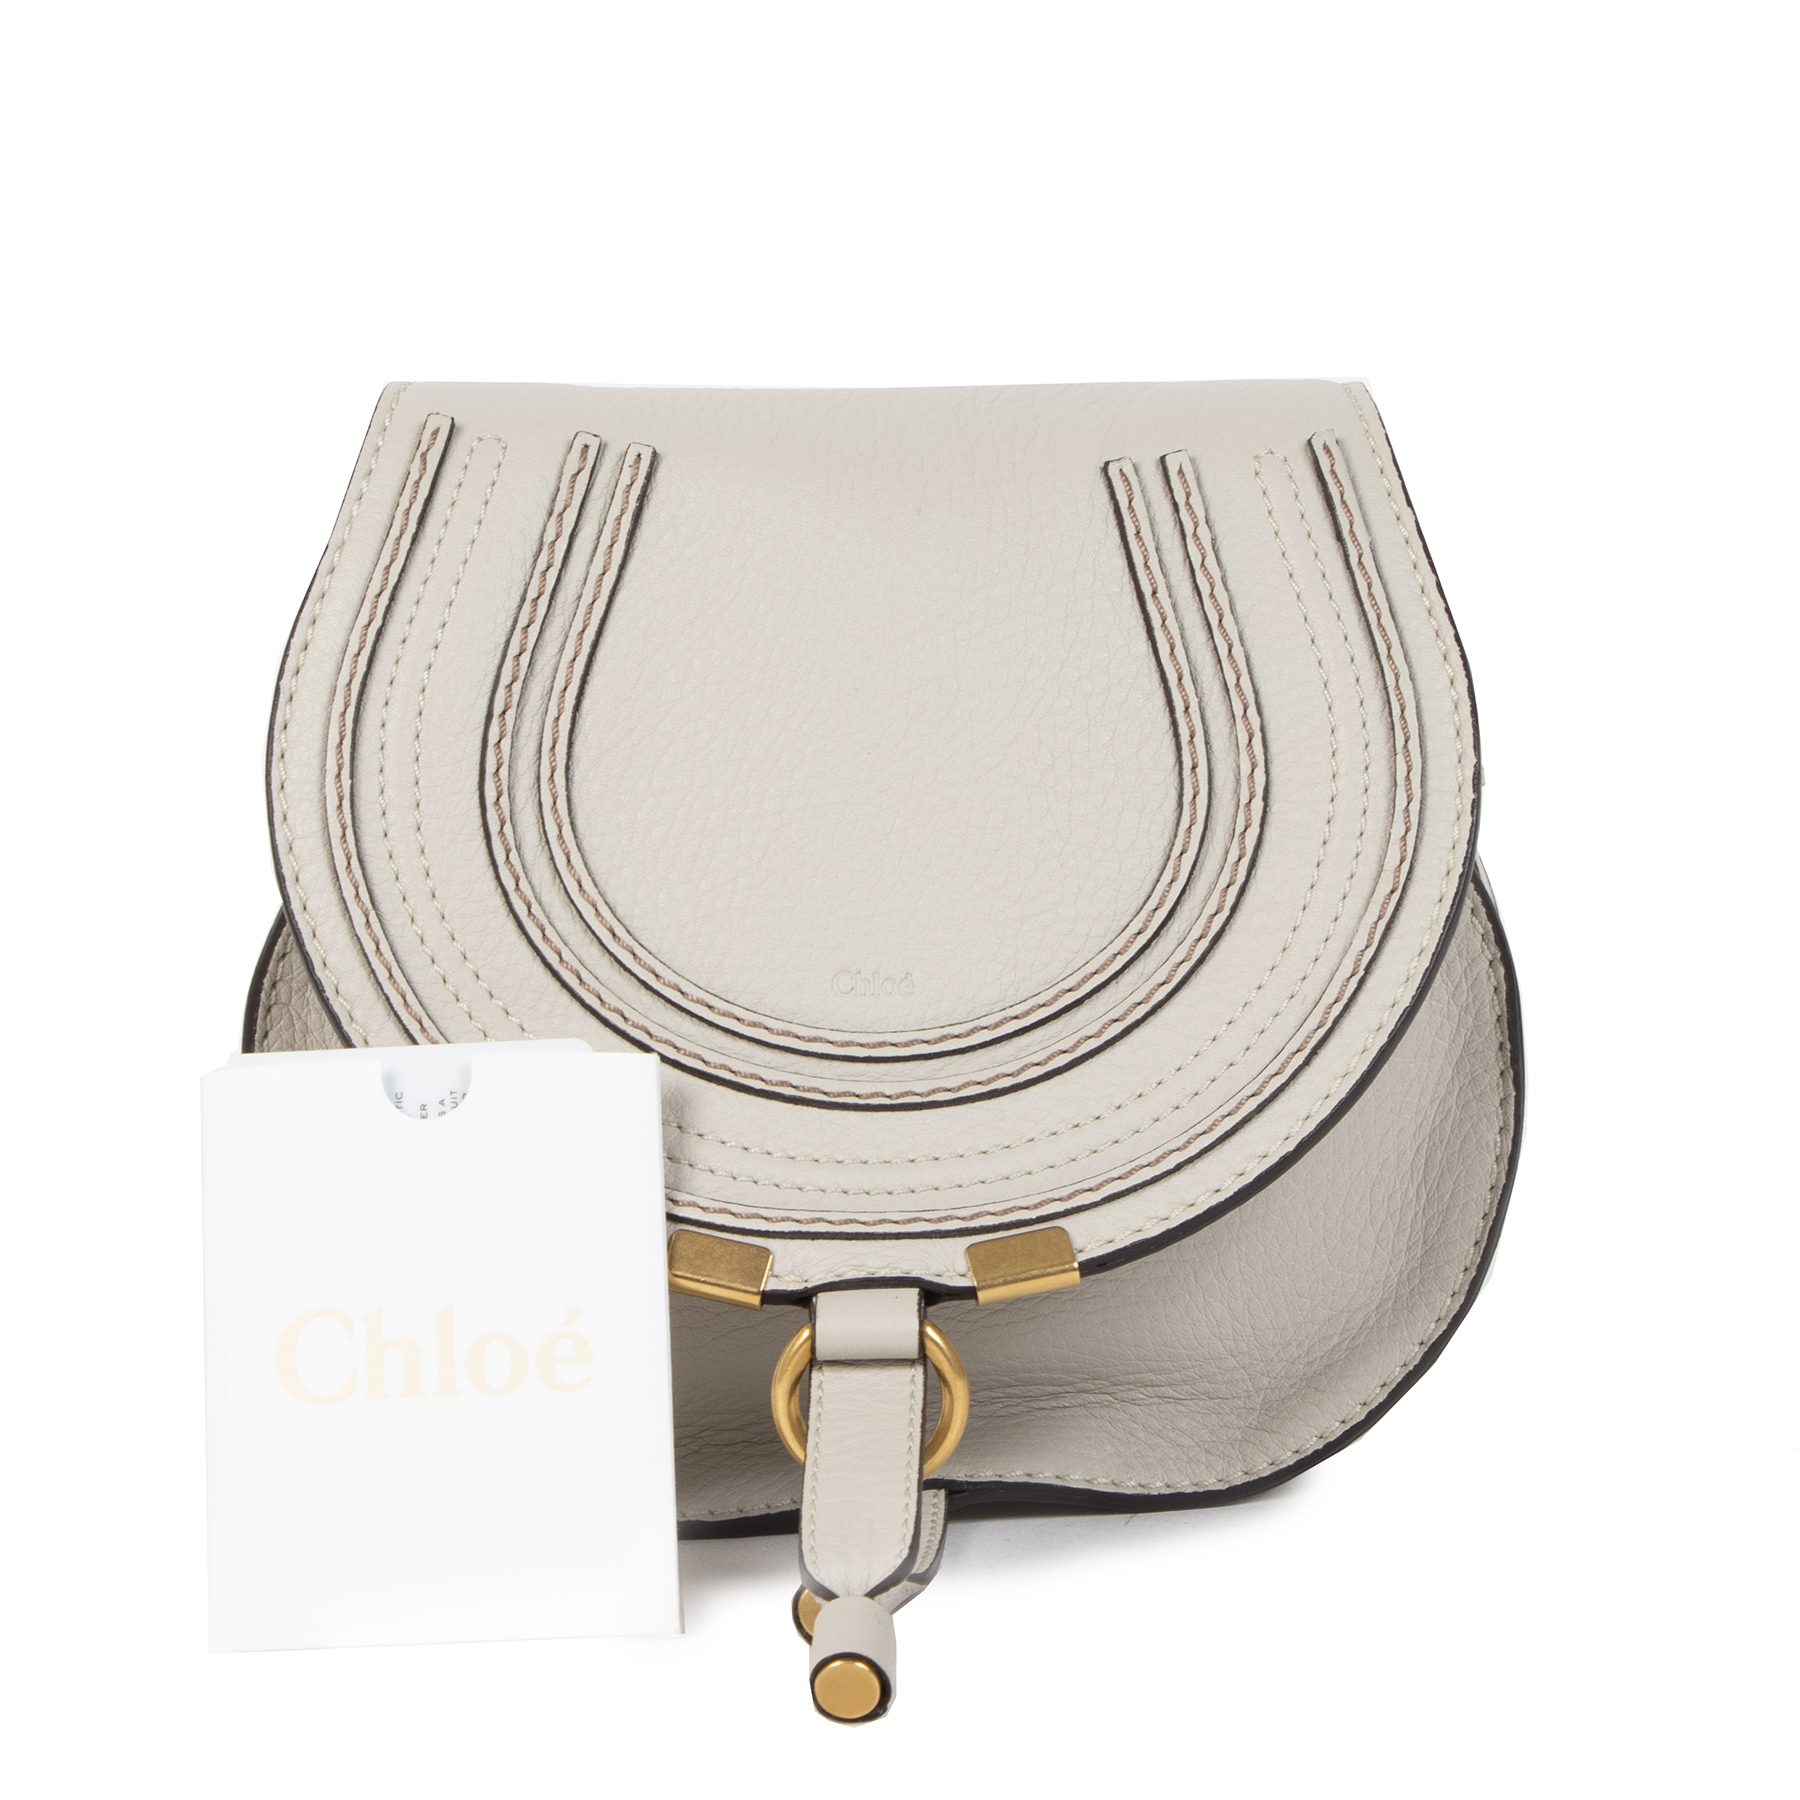 Authentieke tweedehands vintage Chloé Light Cloud Mini Marcie Crossbody Bag buy online webshop LabelLOV